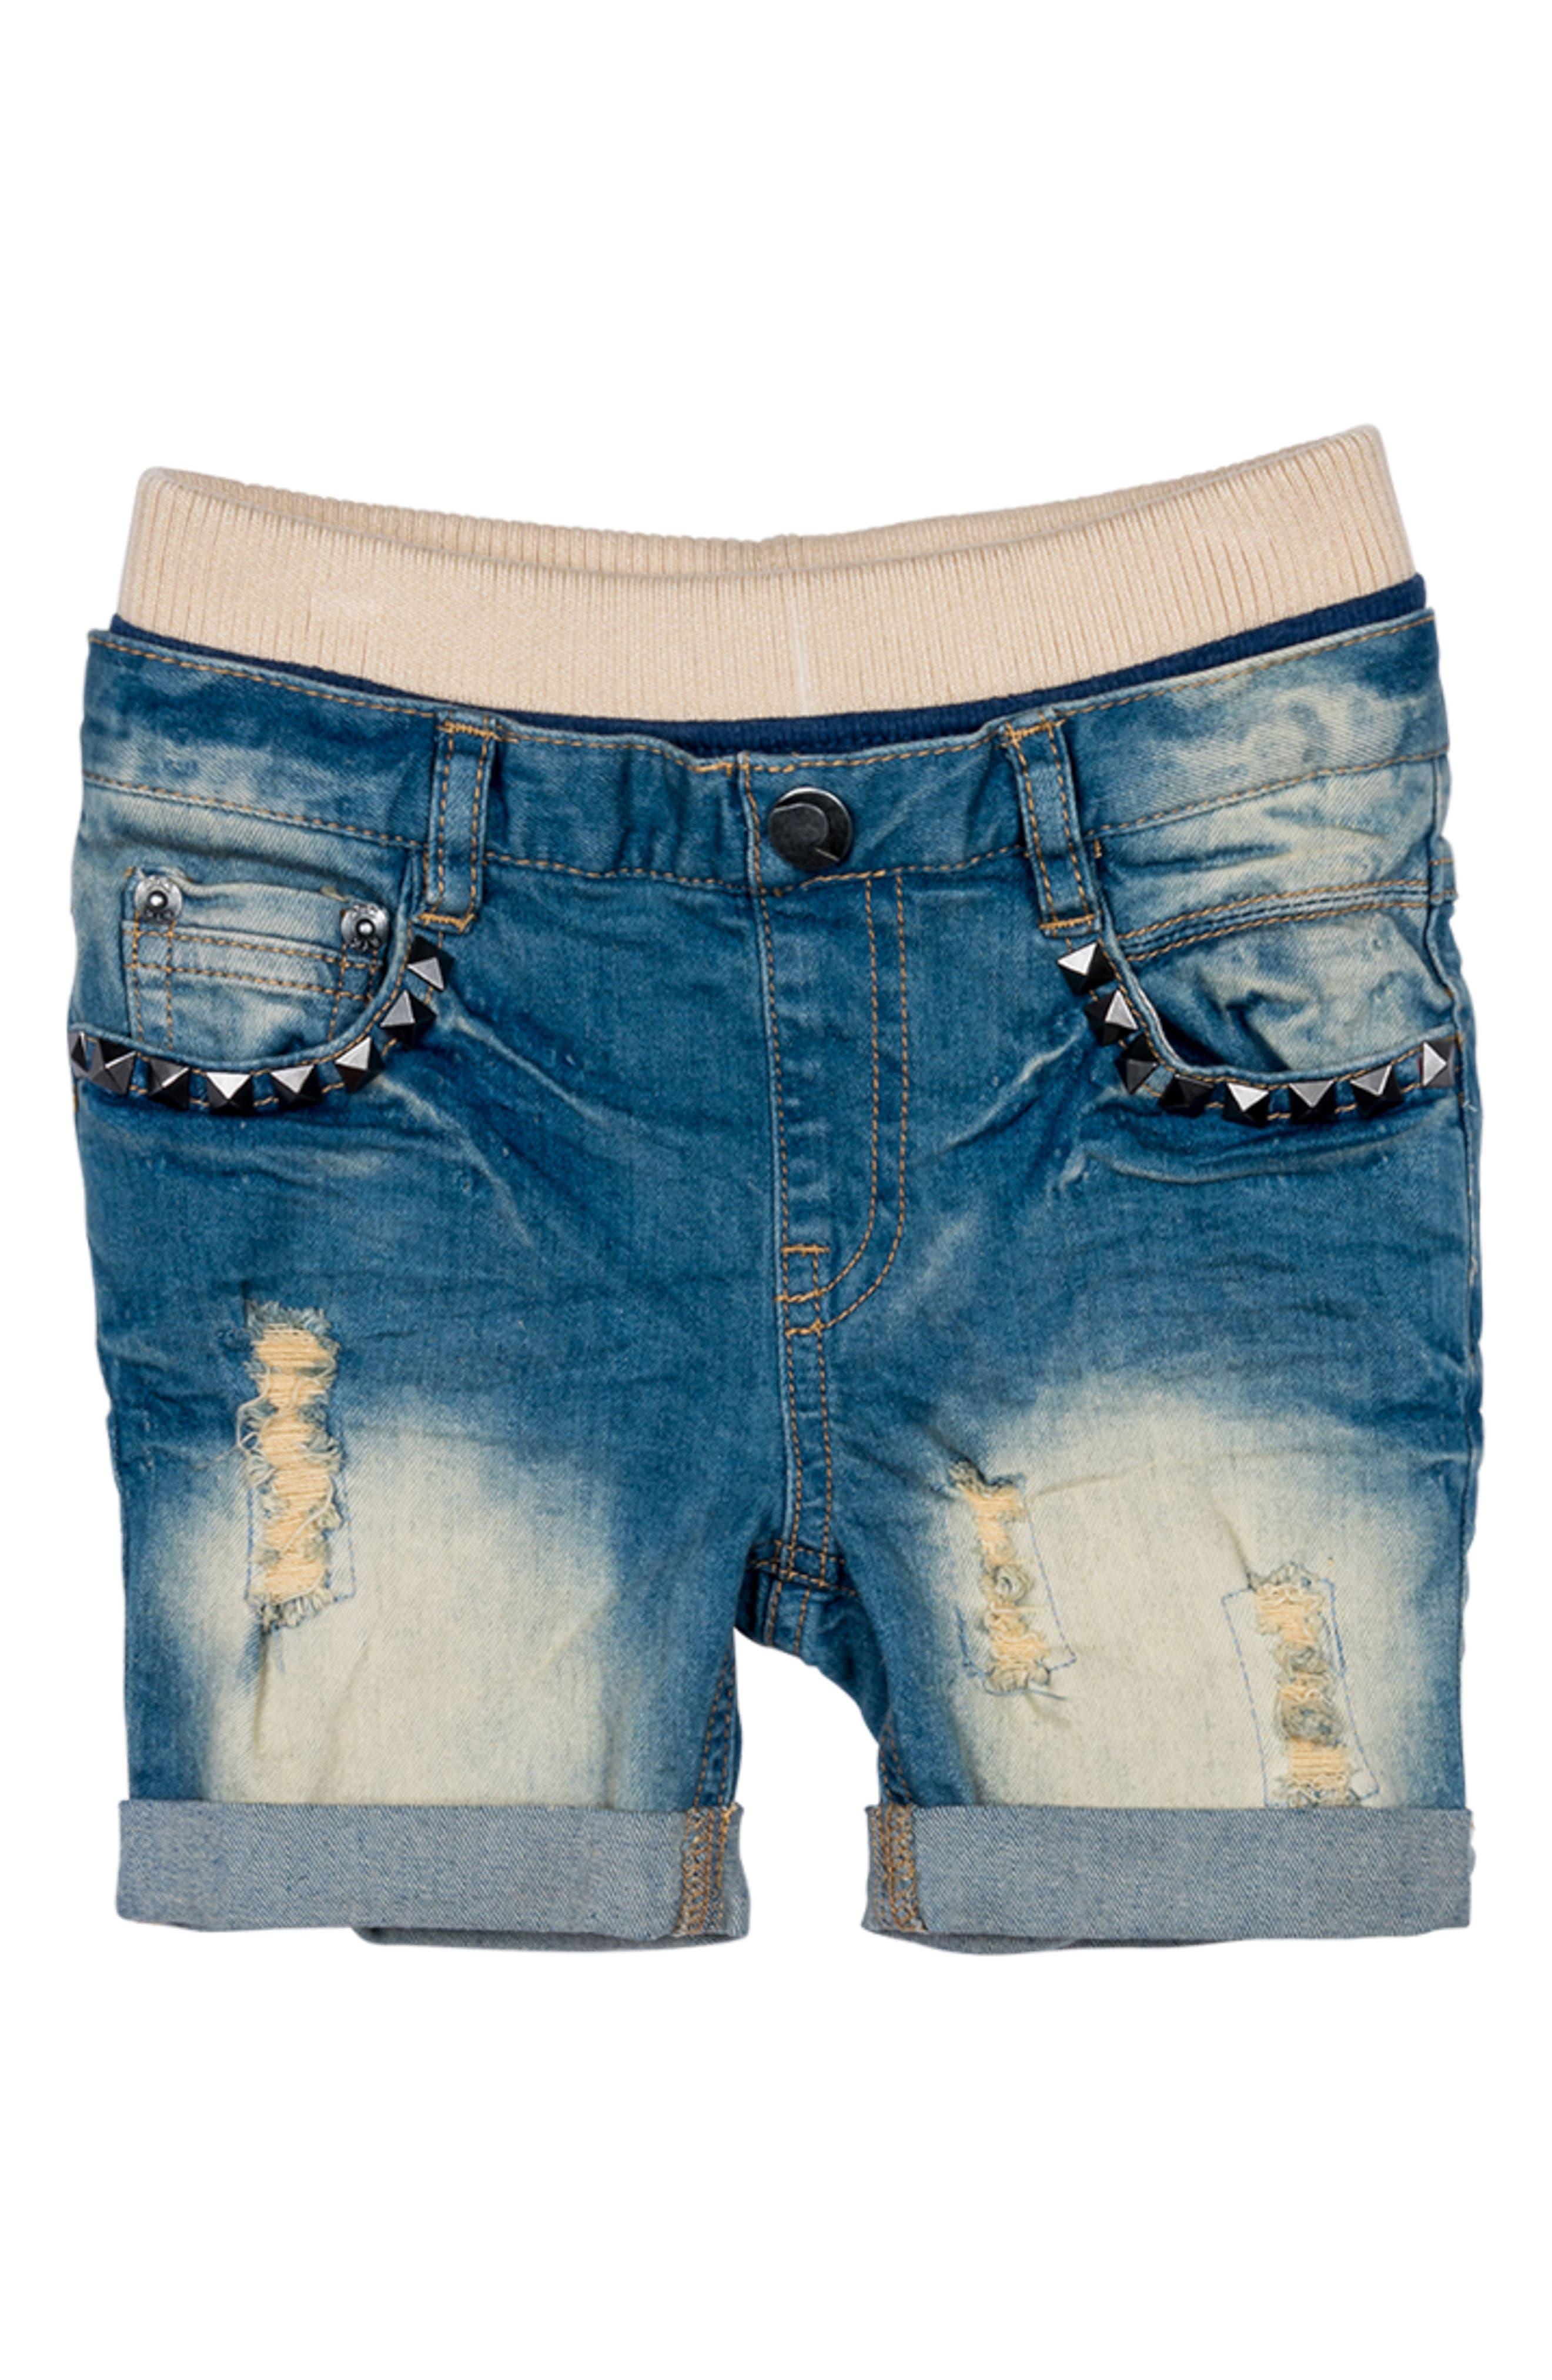 Heavy Metal Denim Shorts,                         Main,                         color, Blue Denim